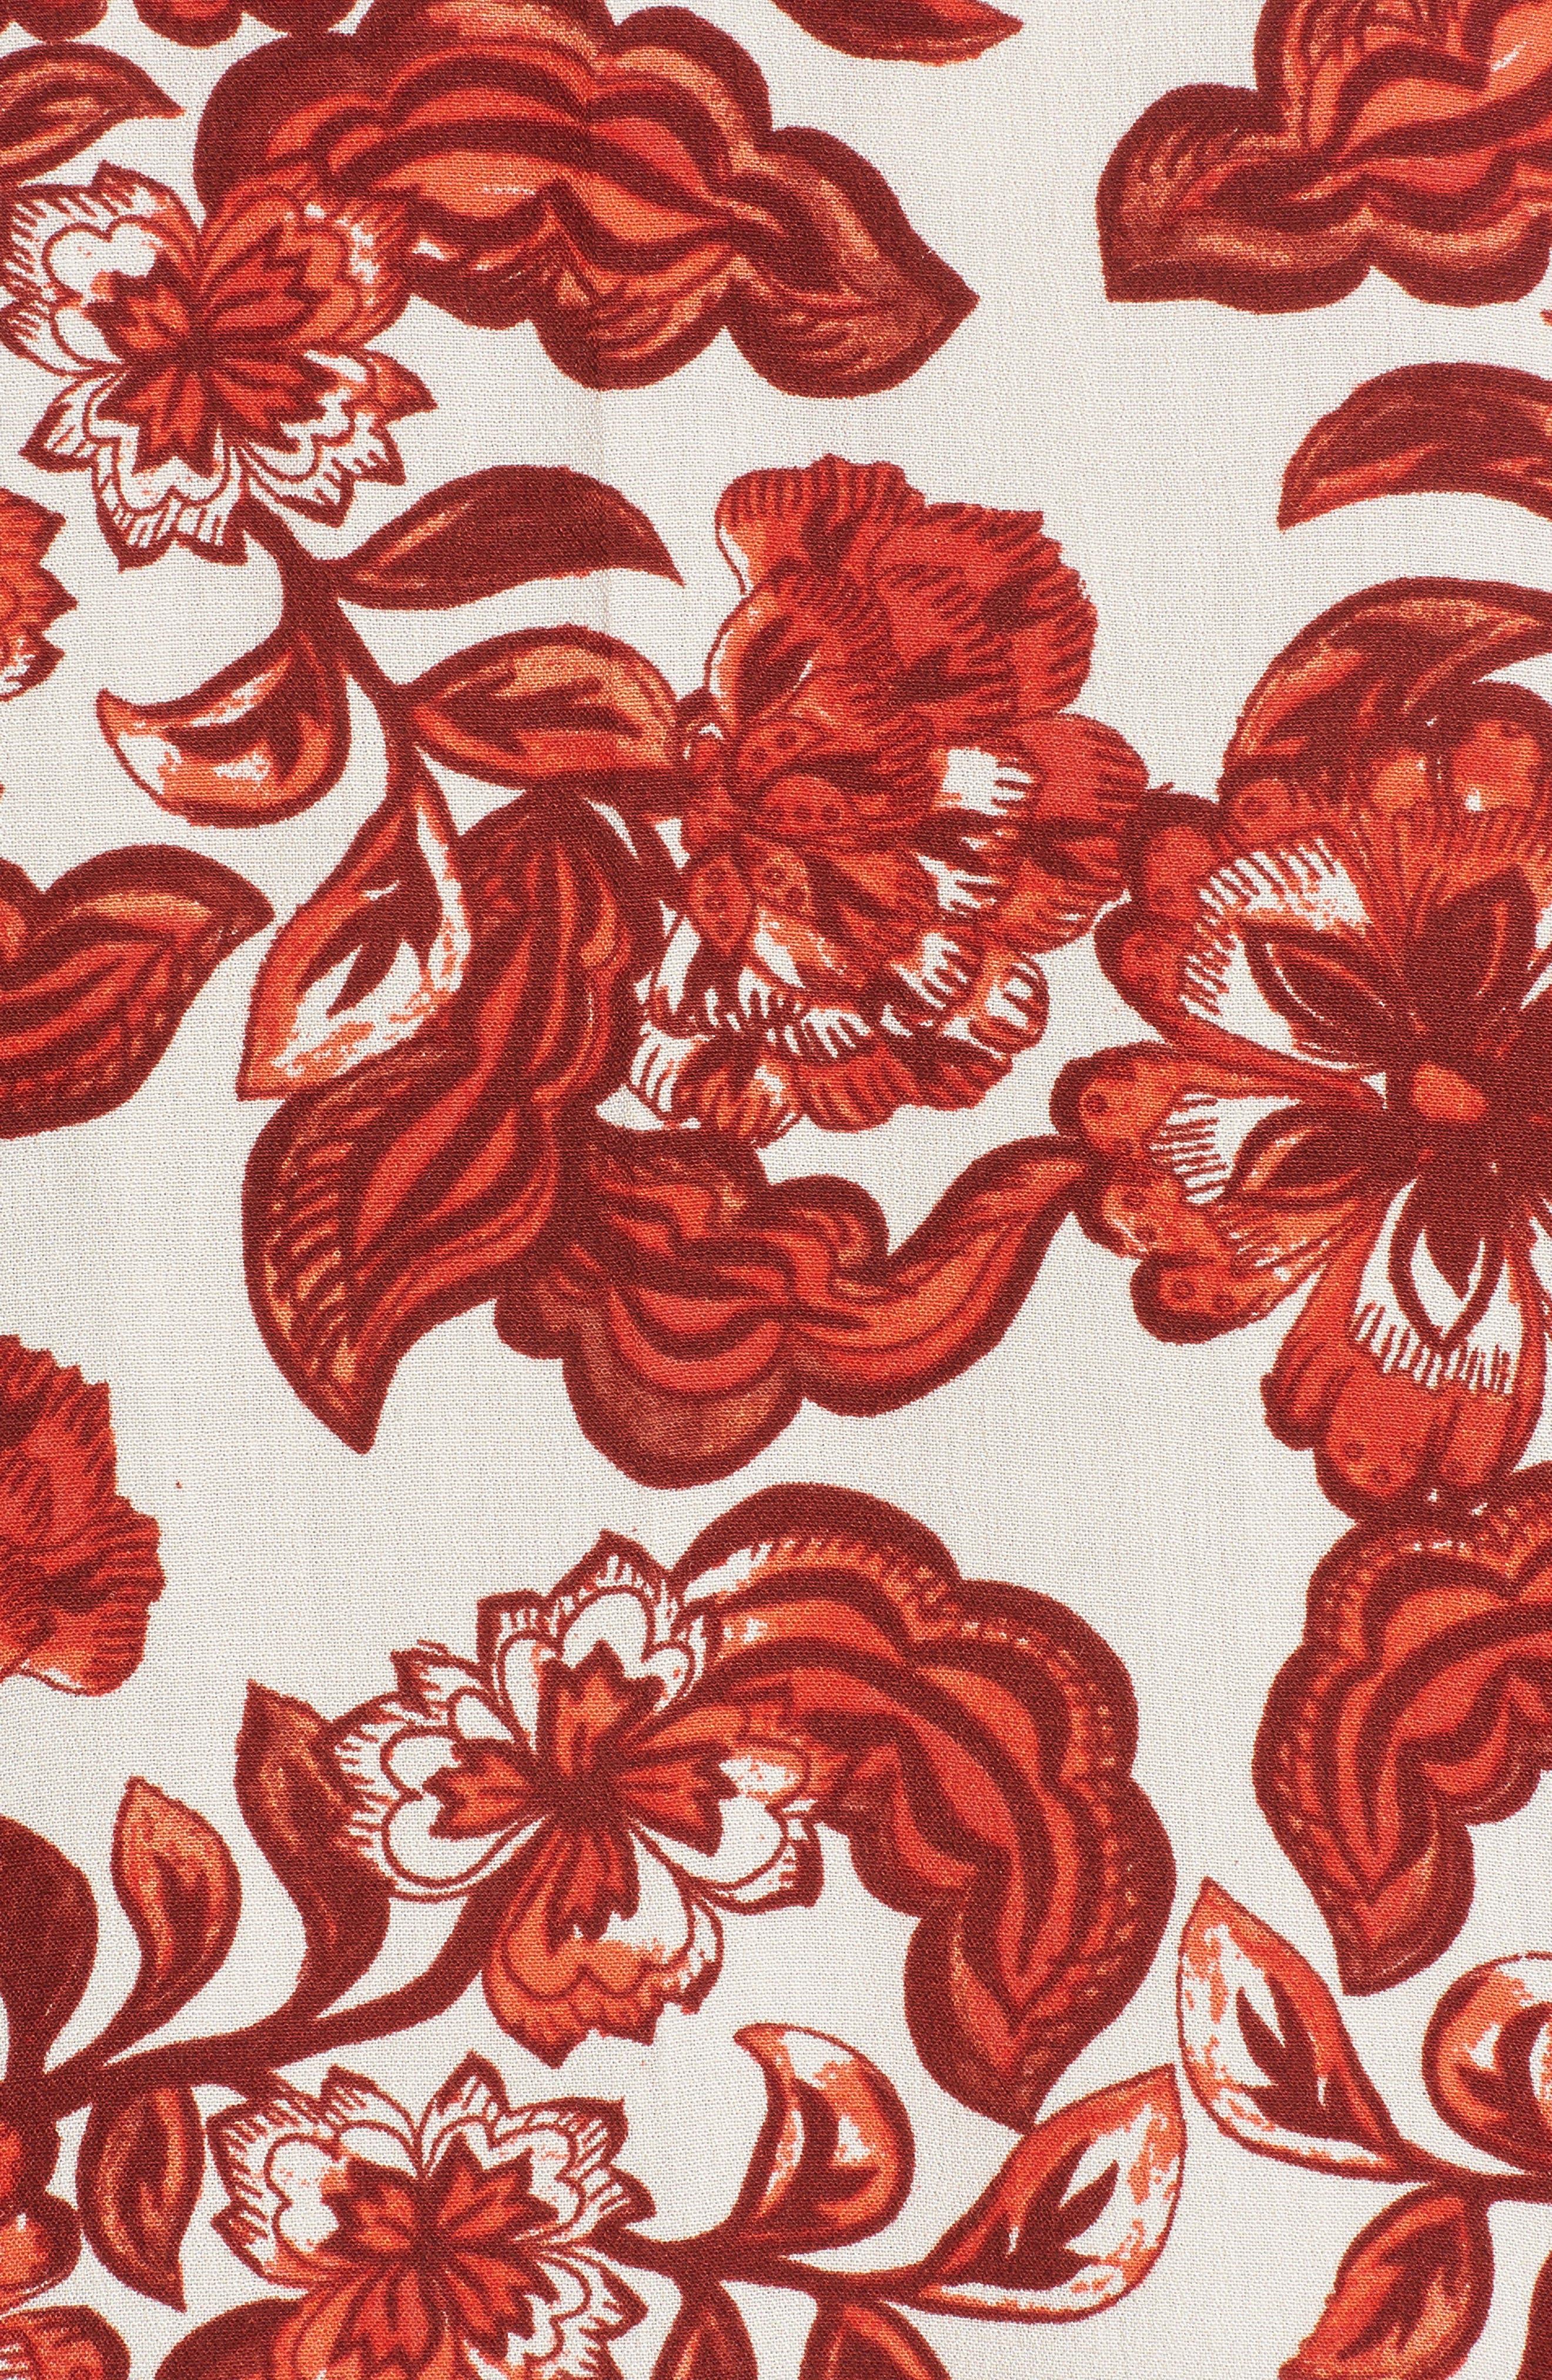 Floral Print Maxi Dress,                             Alternate thumbnail 5, color,                             600